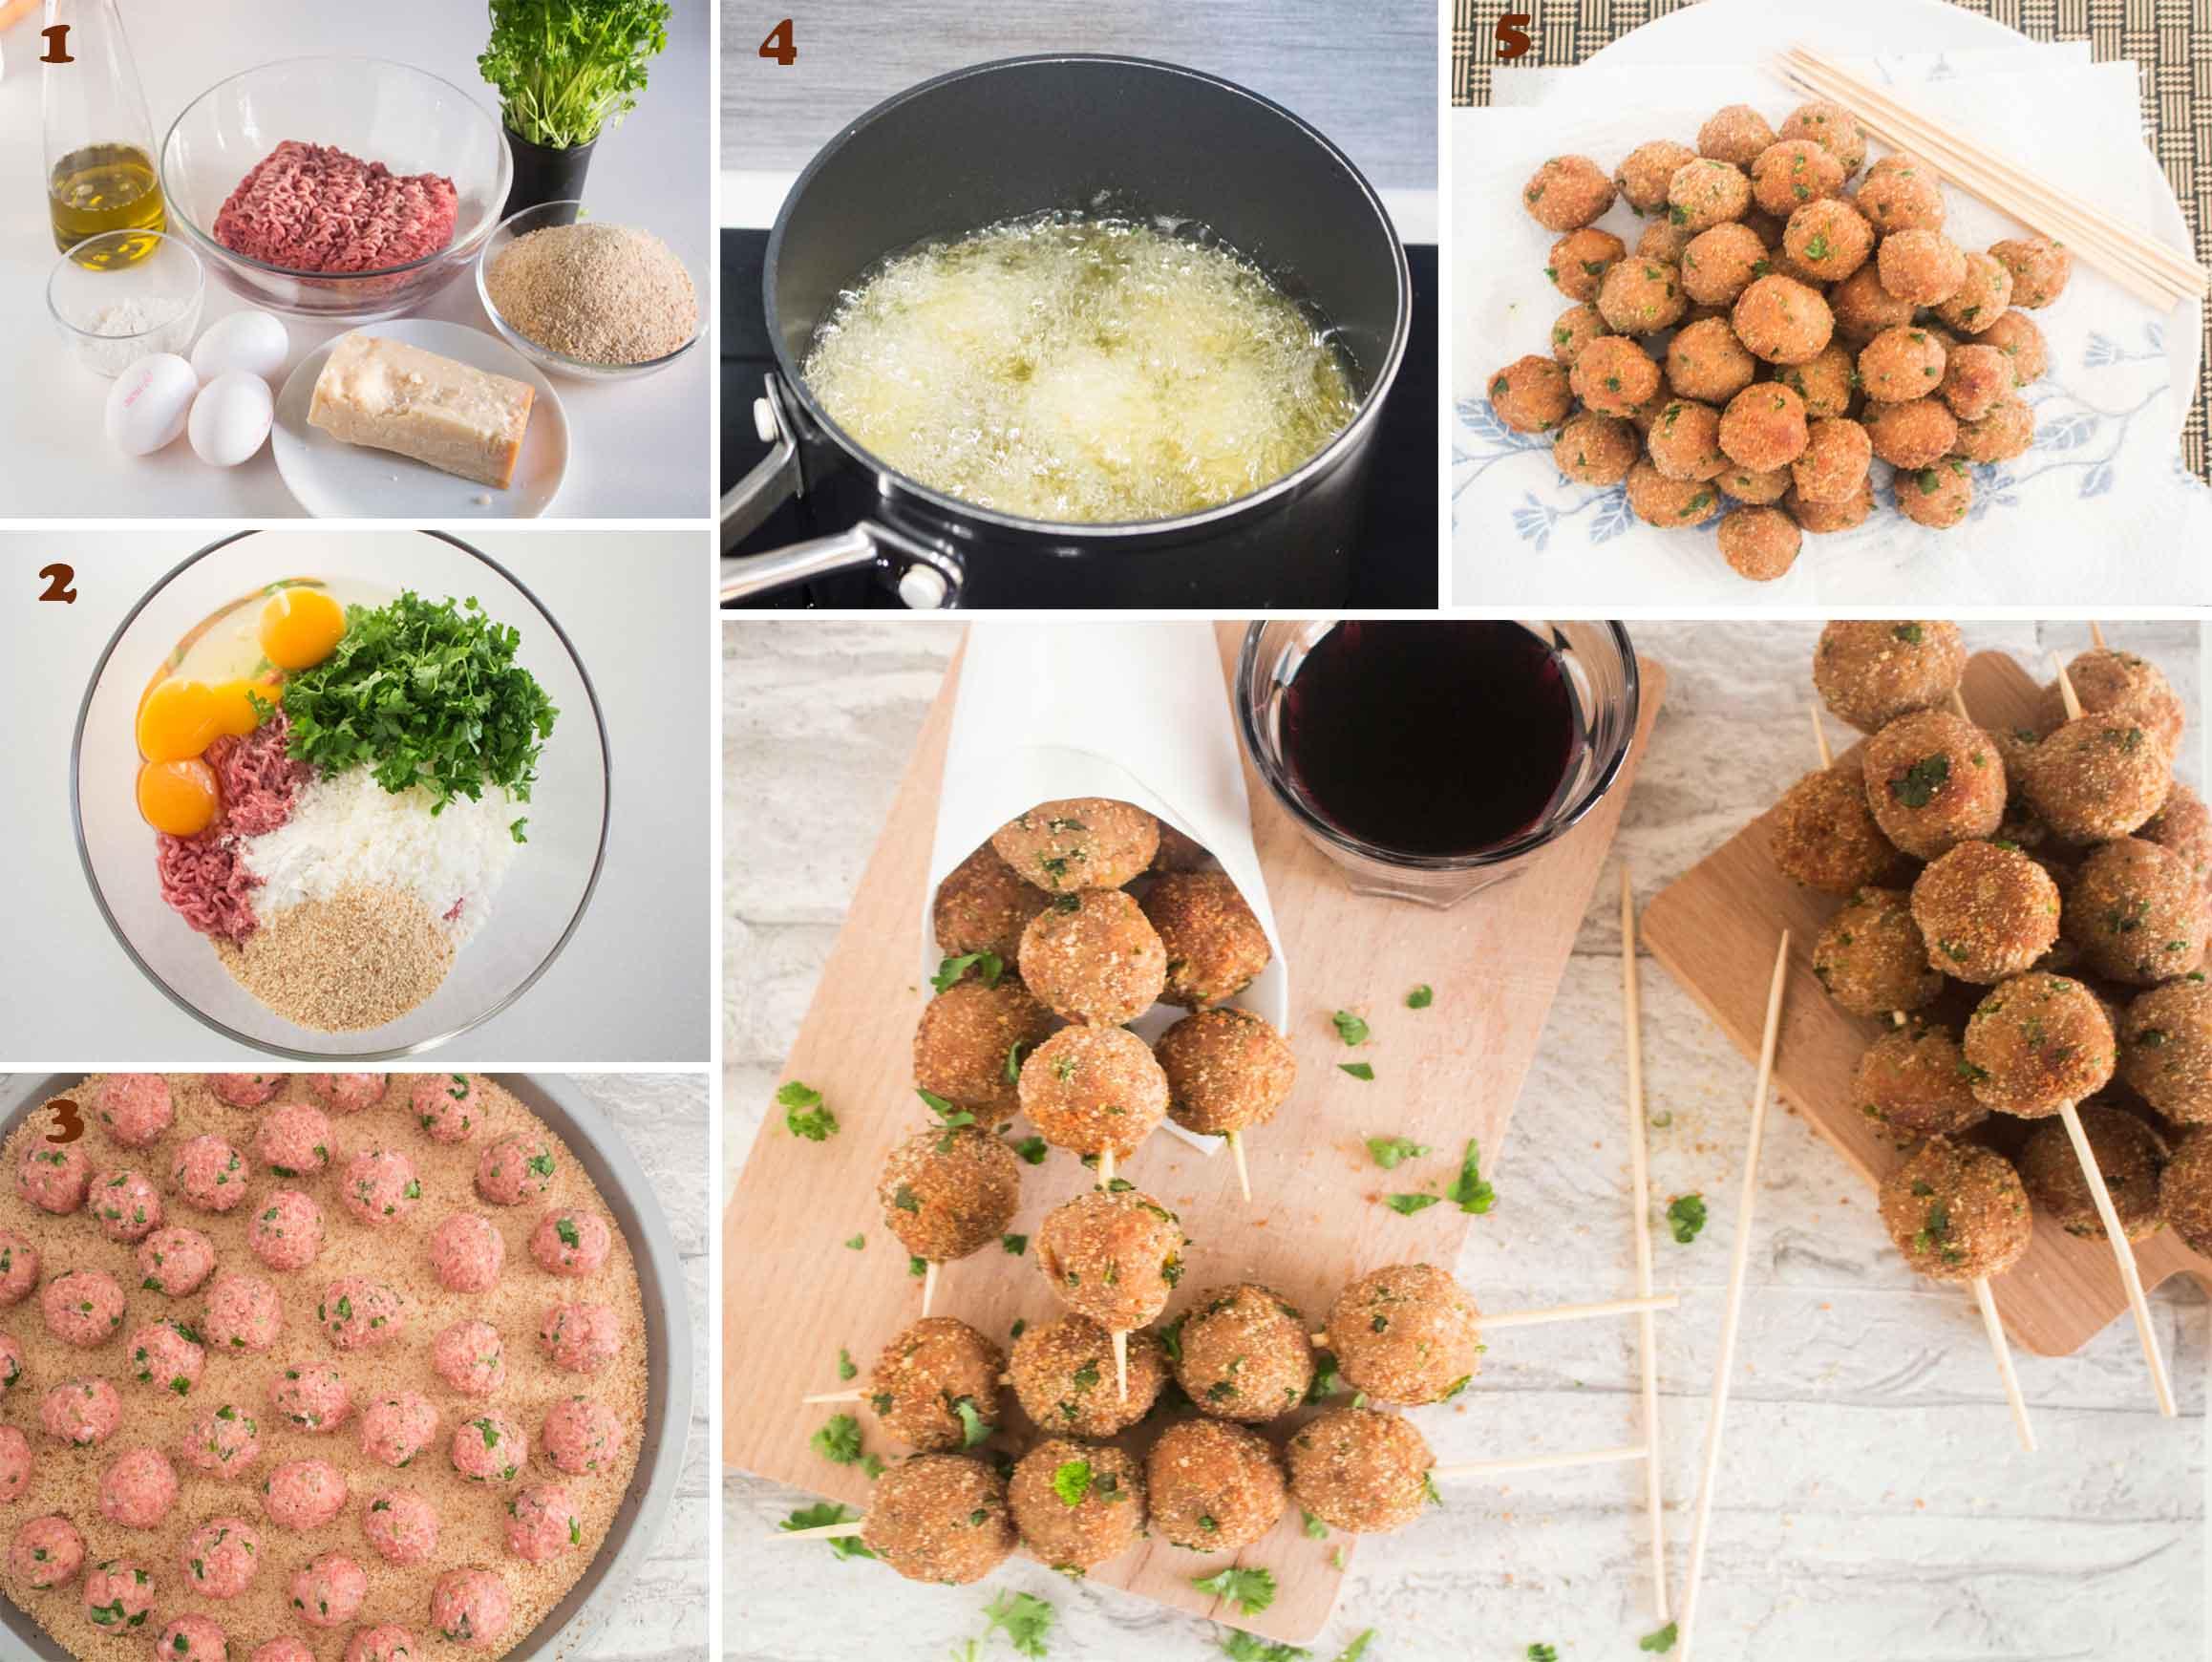 Steps on how to make Mini Meatballs (Polpettine di carne)|foodandjourneys.net